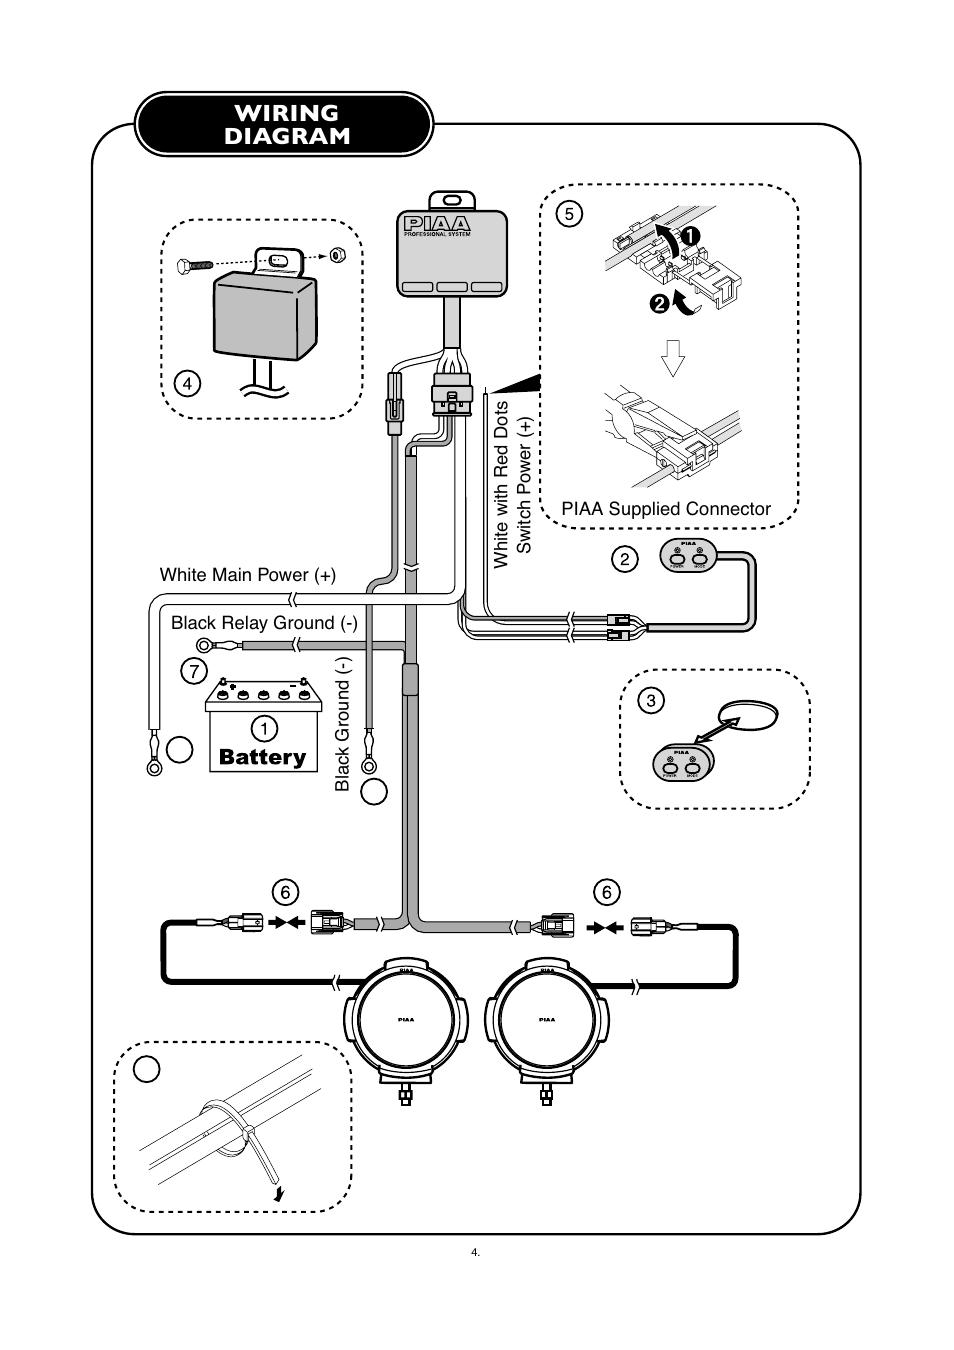 medium resolution of wiring diagram piaa rs800 halogen shock lamp user manual page 5 8piaa wiring diagram 15